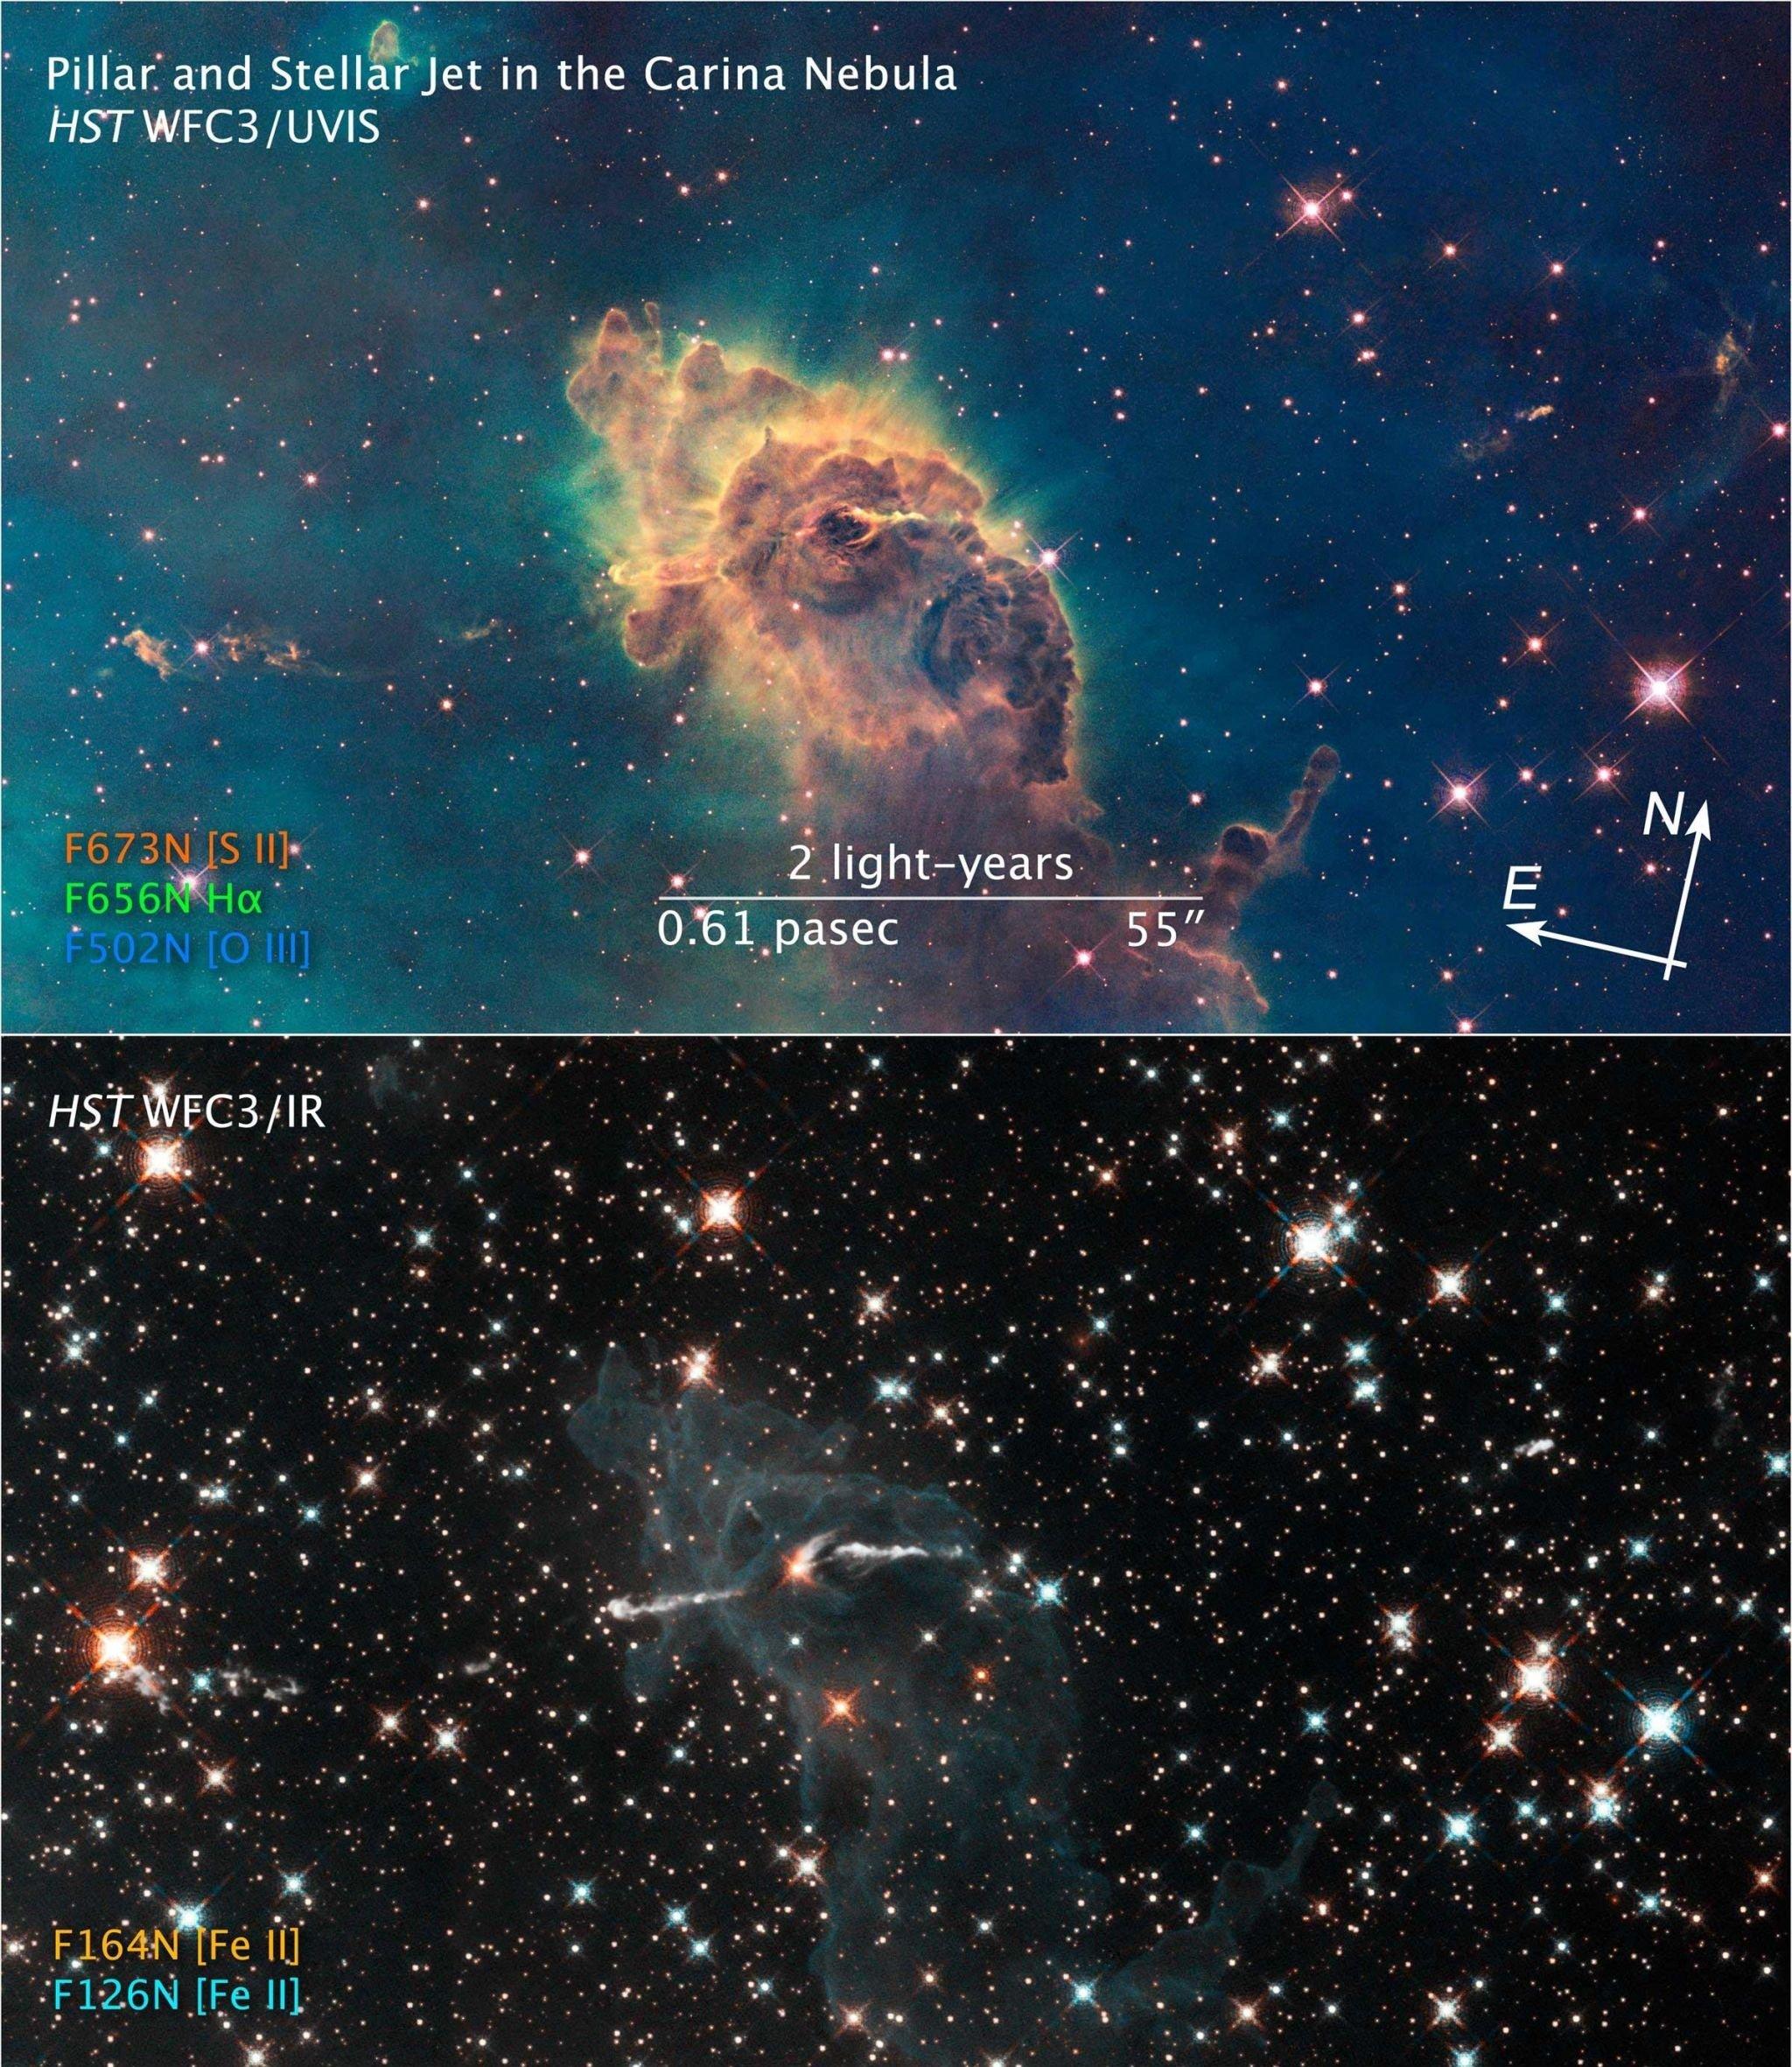 Herbig-Haro 666 en la Nebulosa Carina